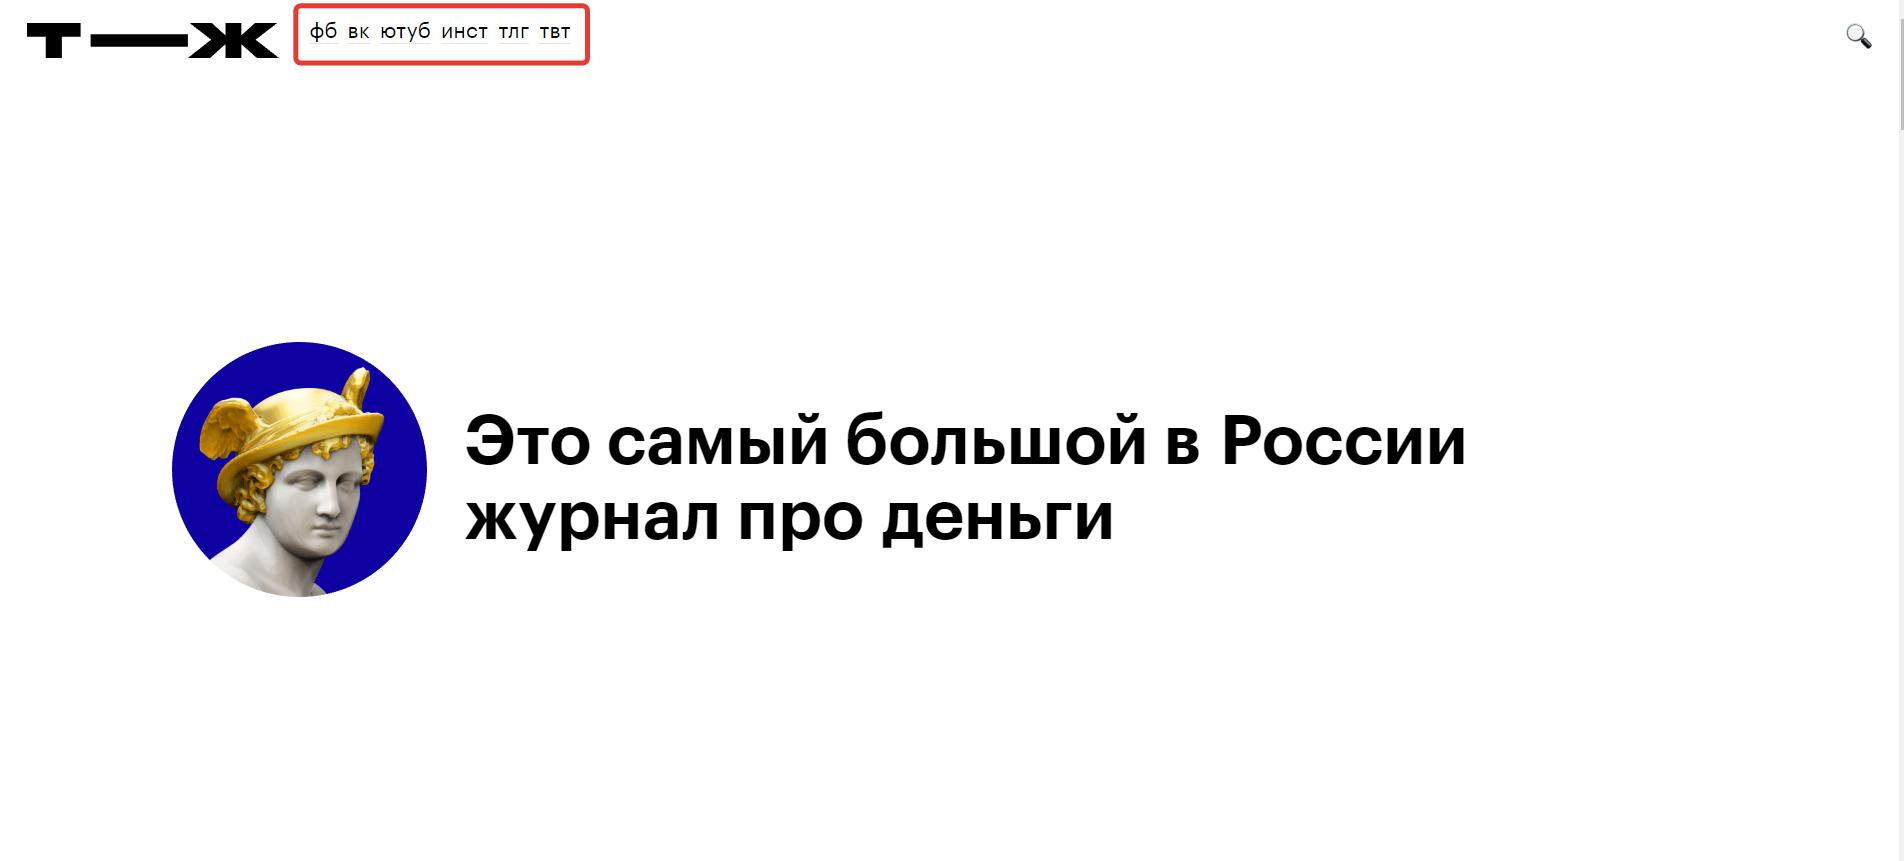 "блог банка ""Тинькофф"""